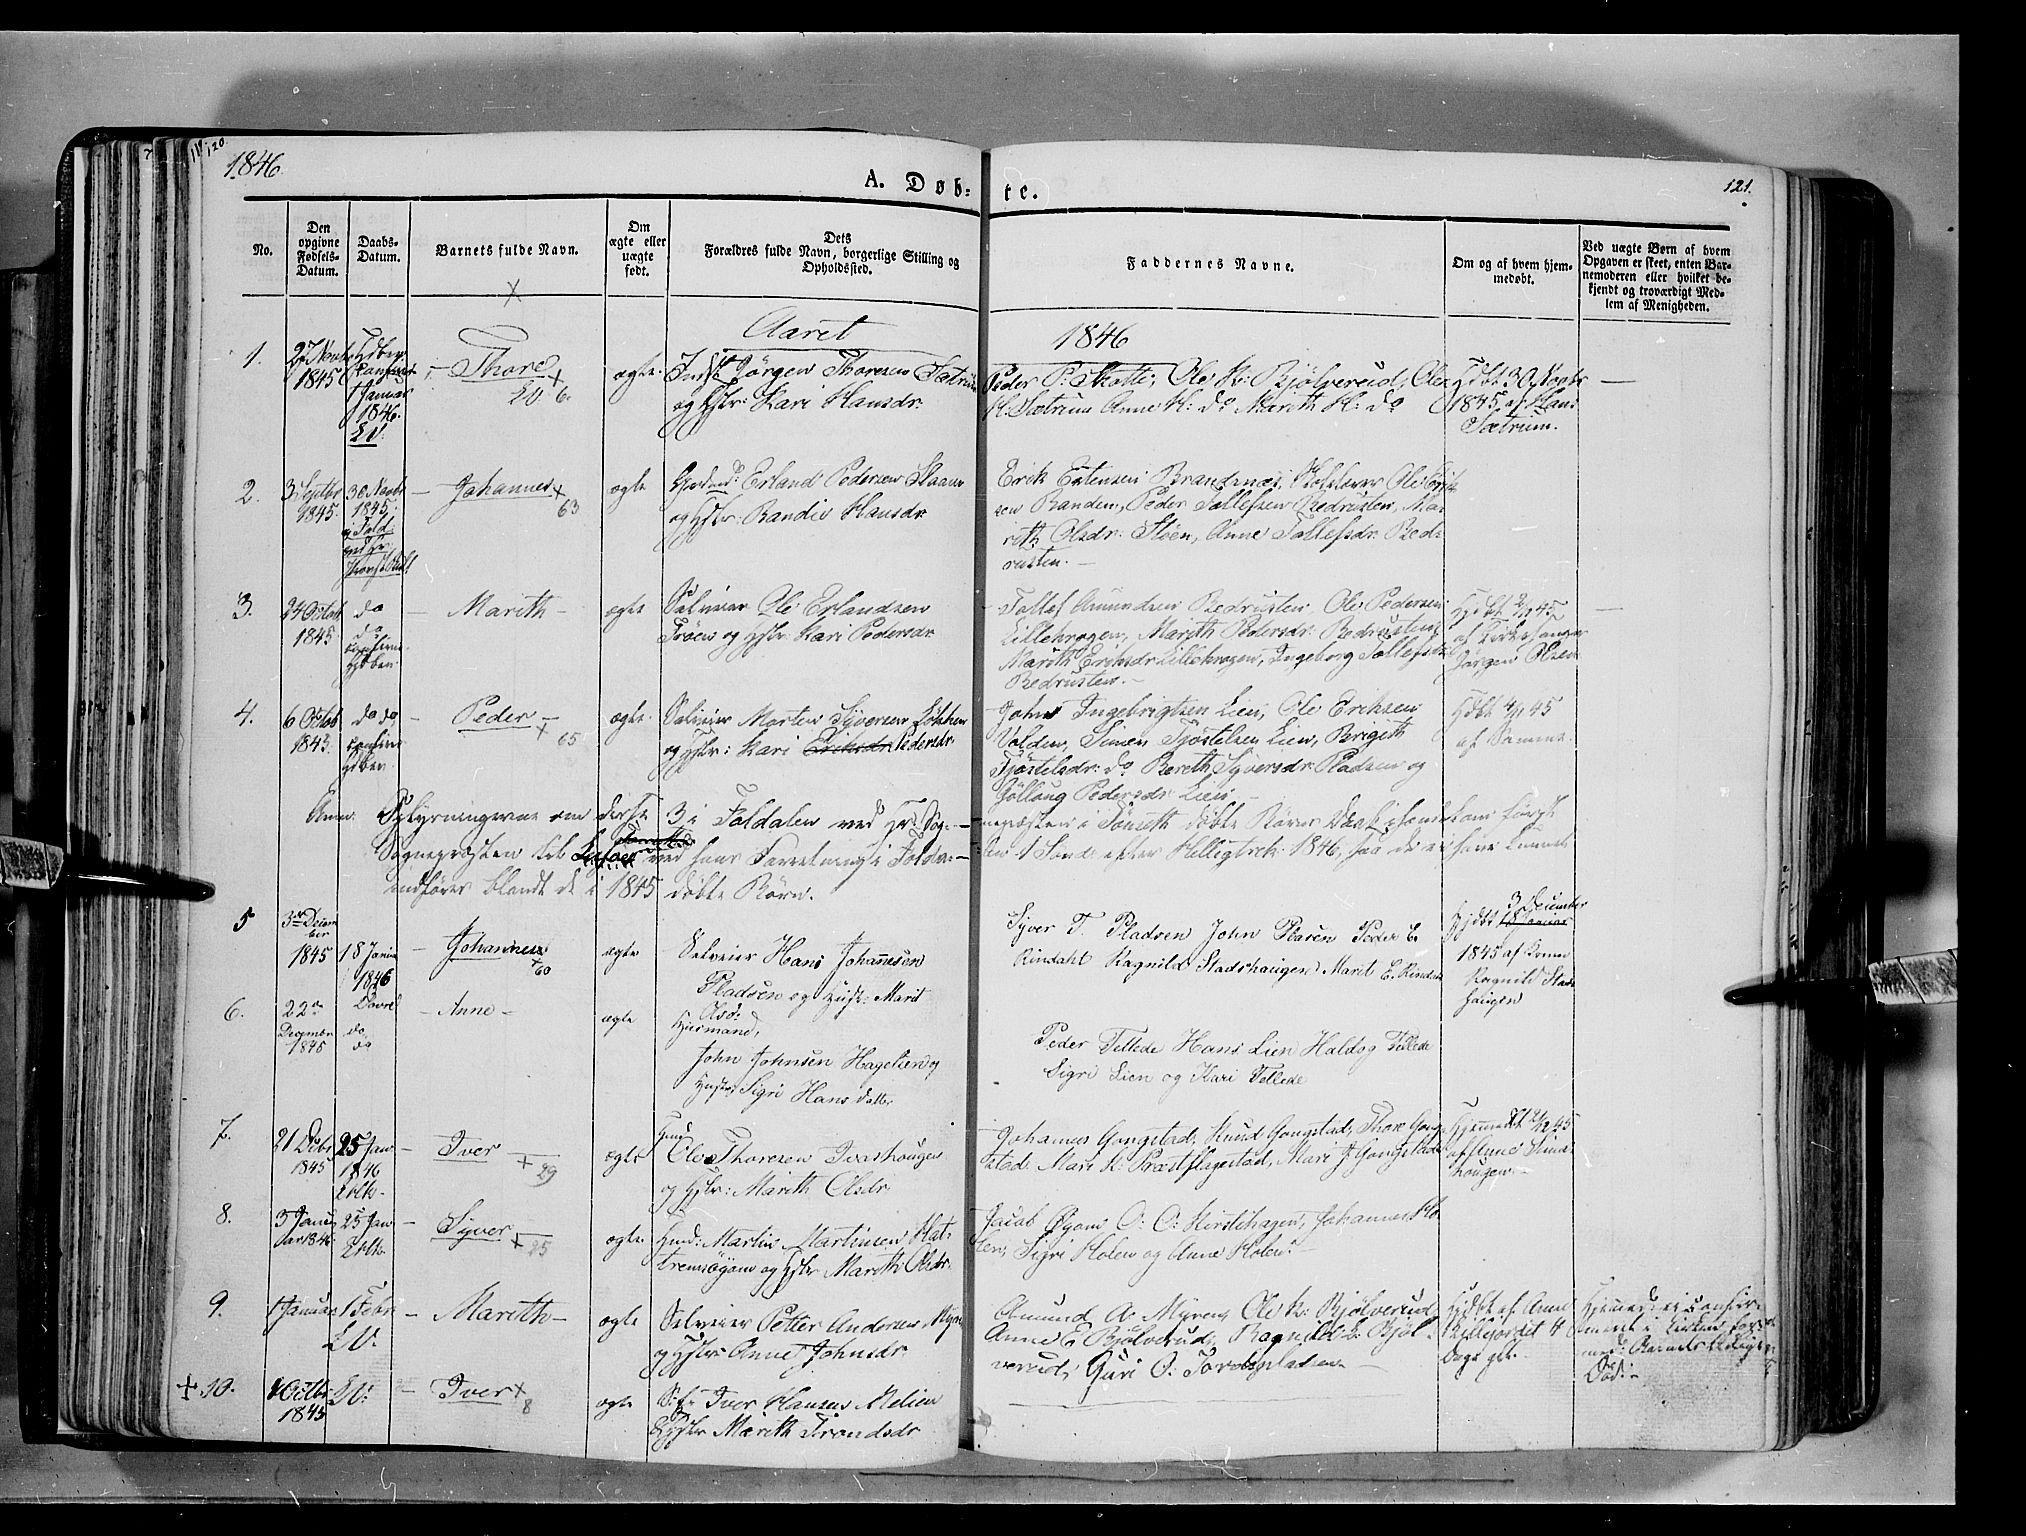 SAH, Lesja prestekontor, Ministerialbok nr. 6A, 1843-1854, s. 120-121